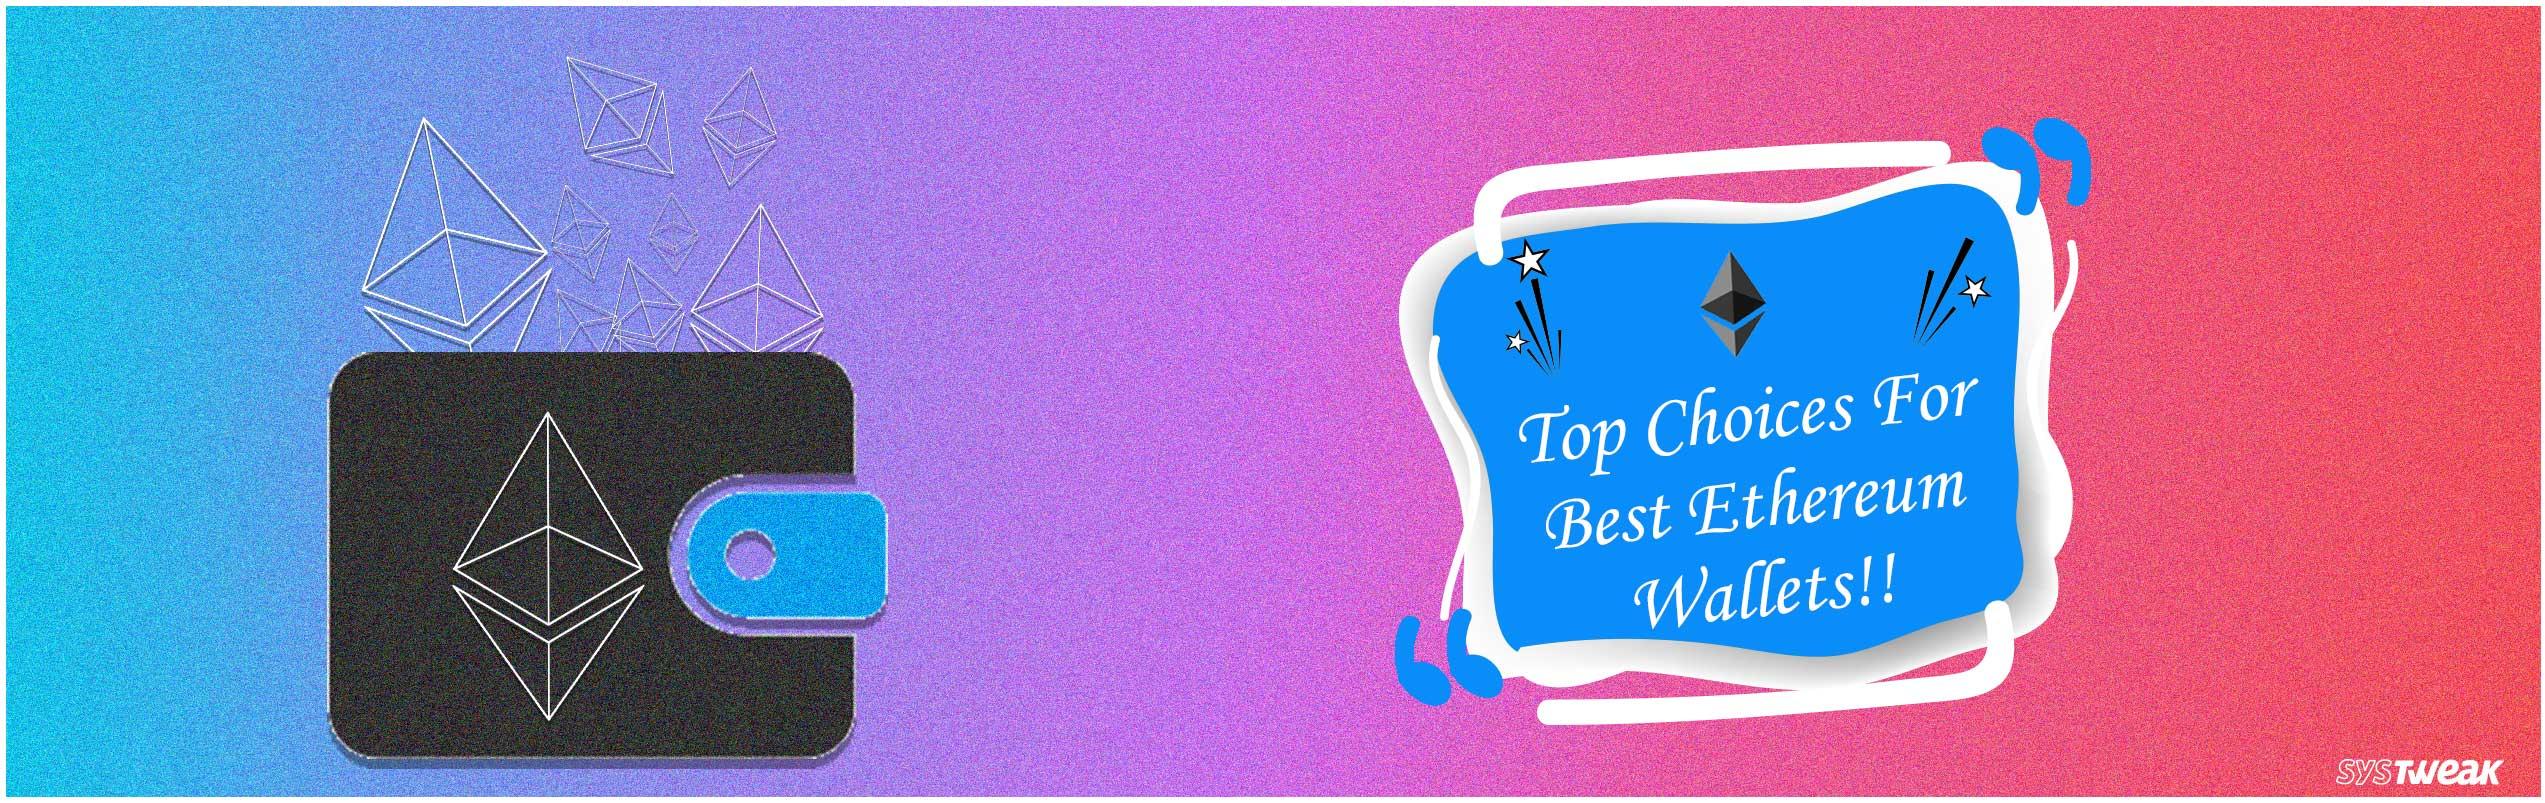 Best Ethereum Wallets in 2018